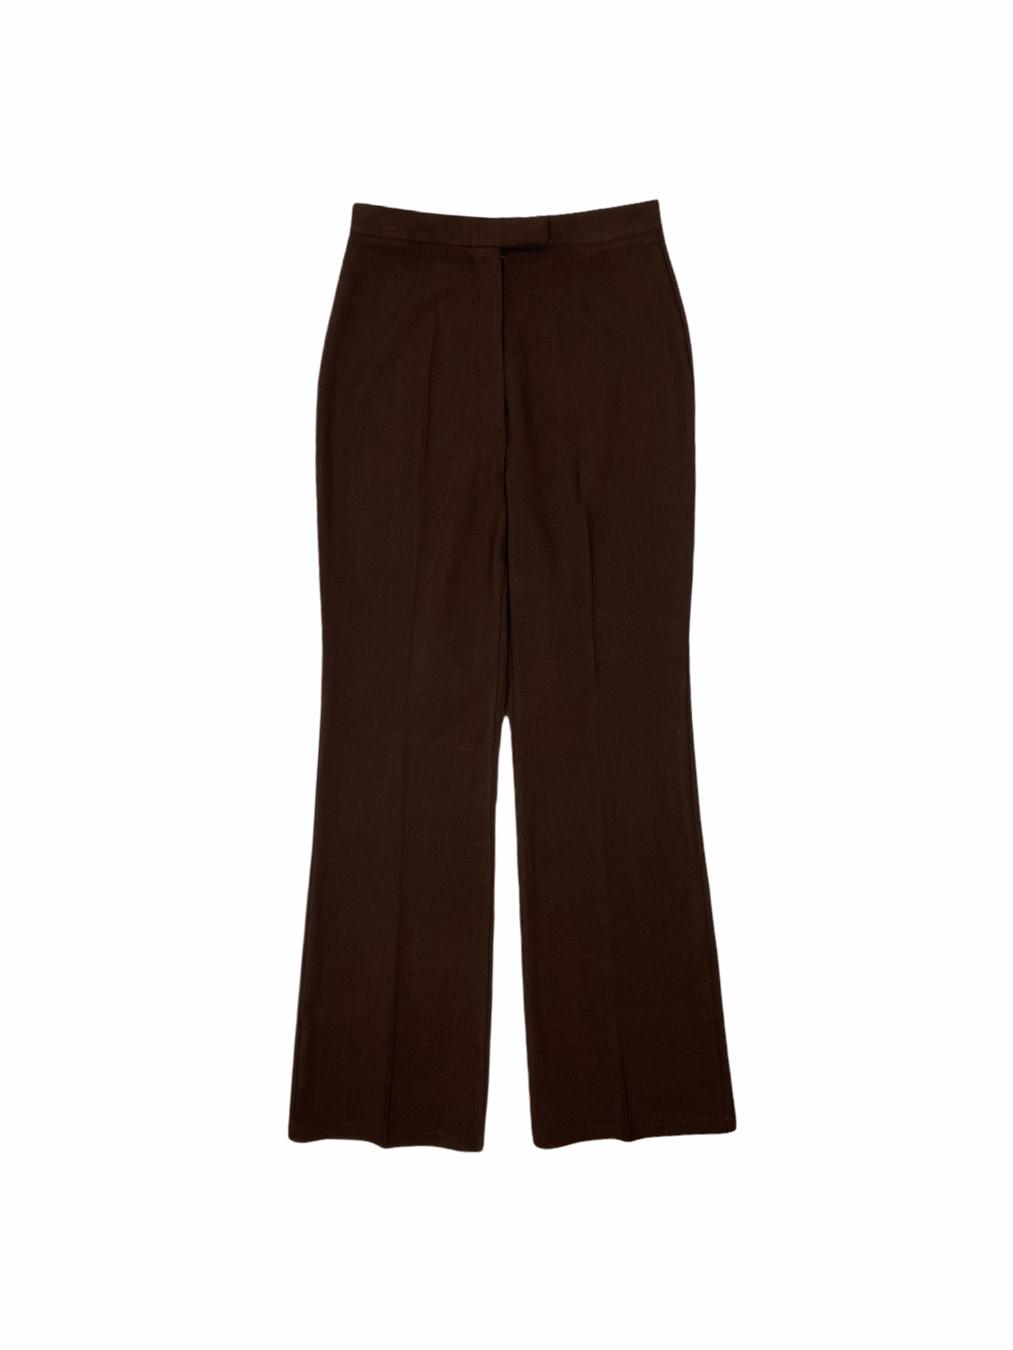 Womens Shaggy Pants (Brown)